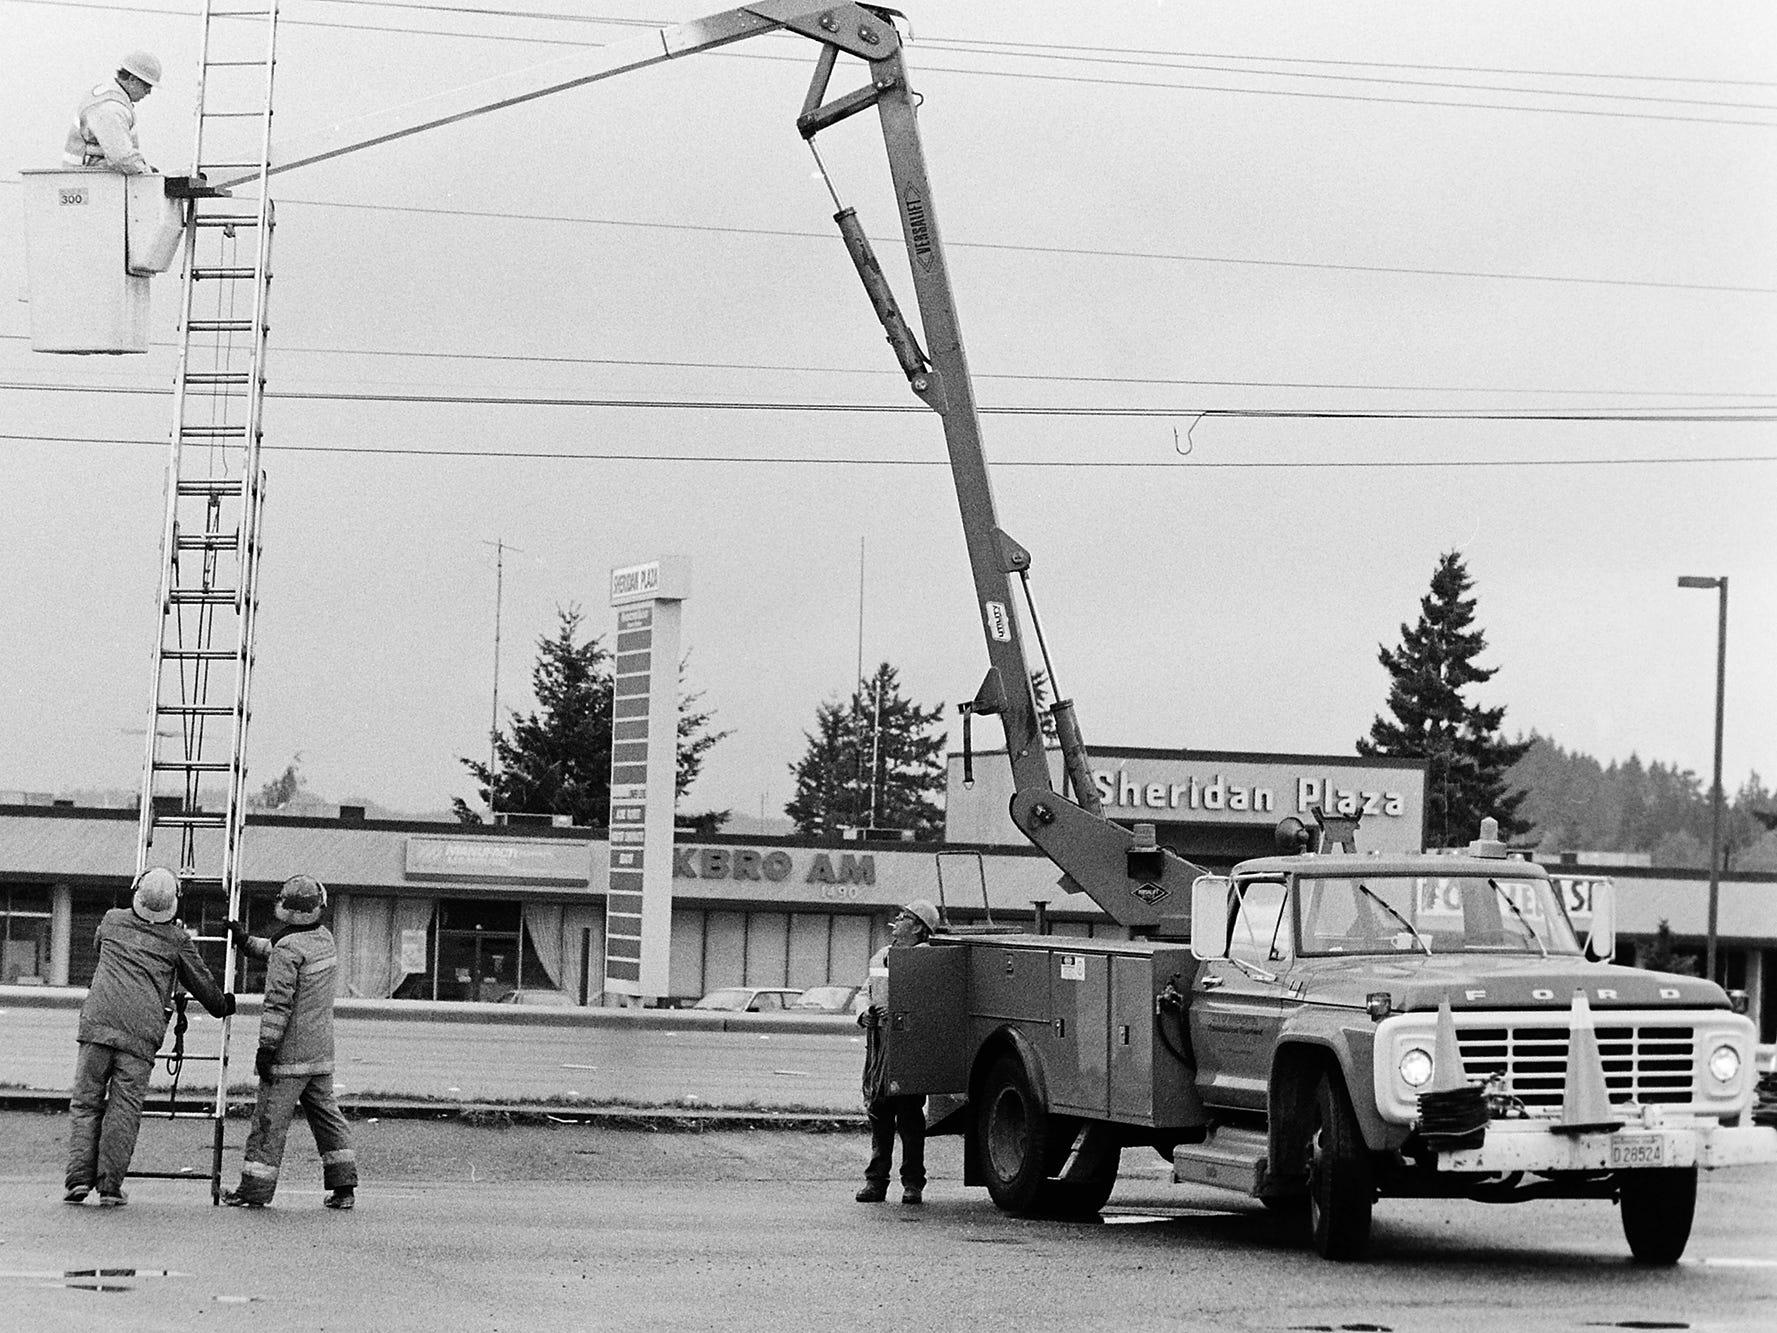 06/03/88Bremerton Employee Rescued